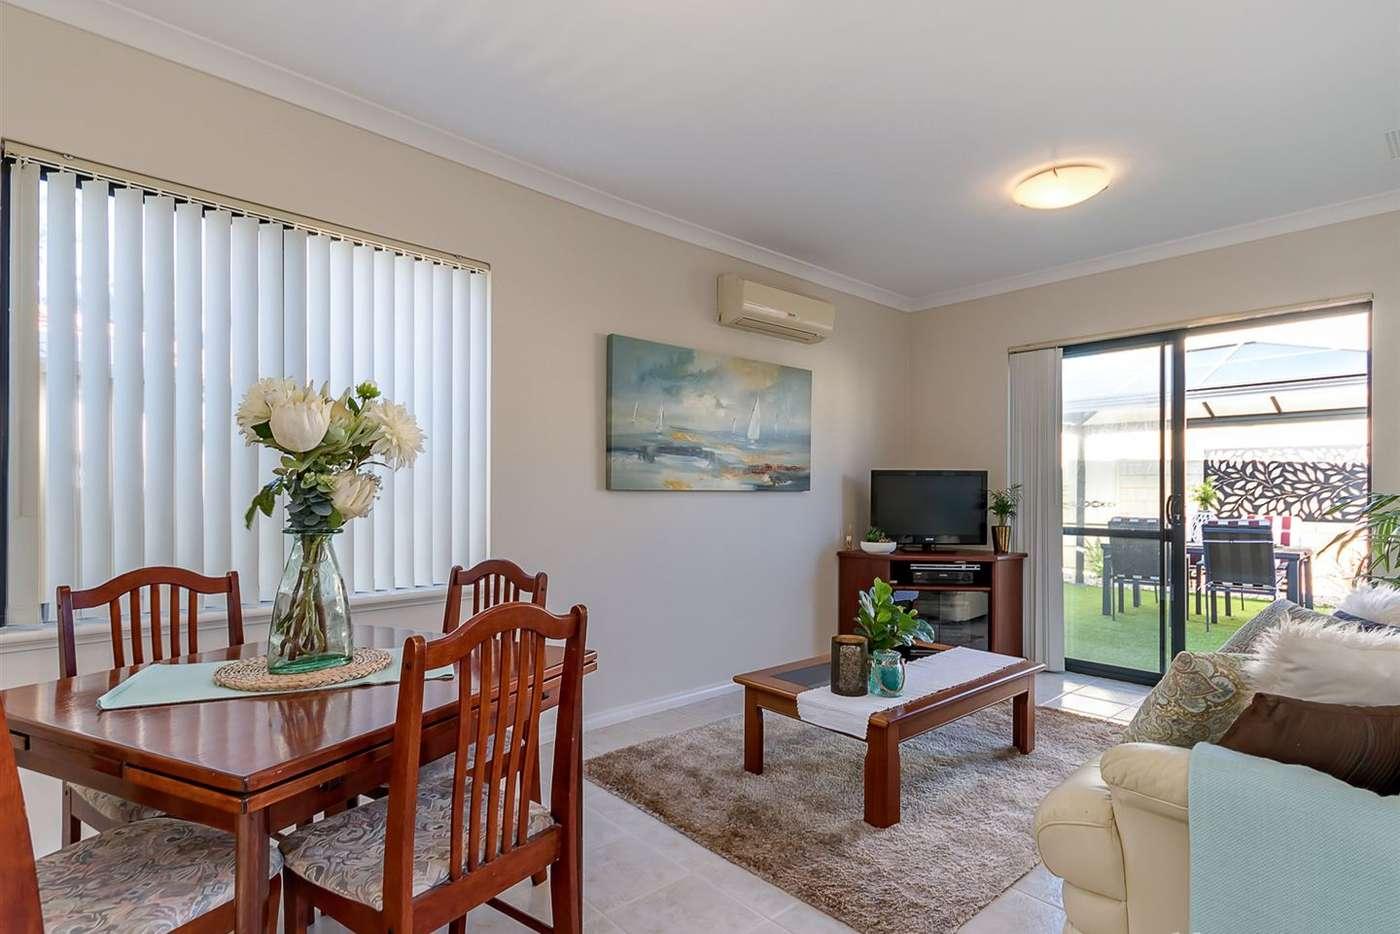 Main view of Homely unit listing, 5/157 Kinross Drive, Kinross WA 6028